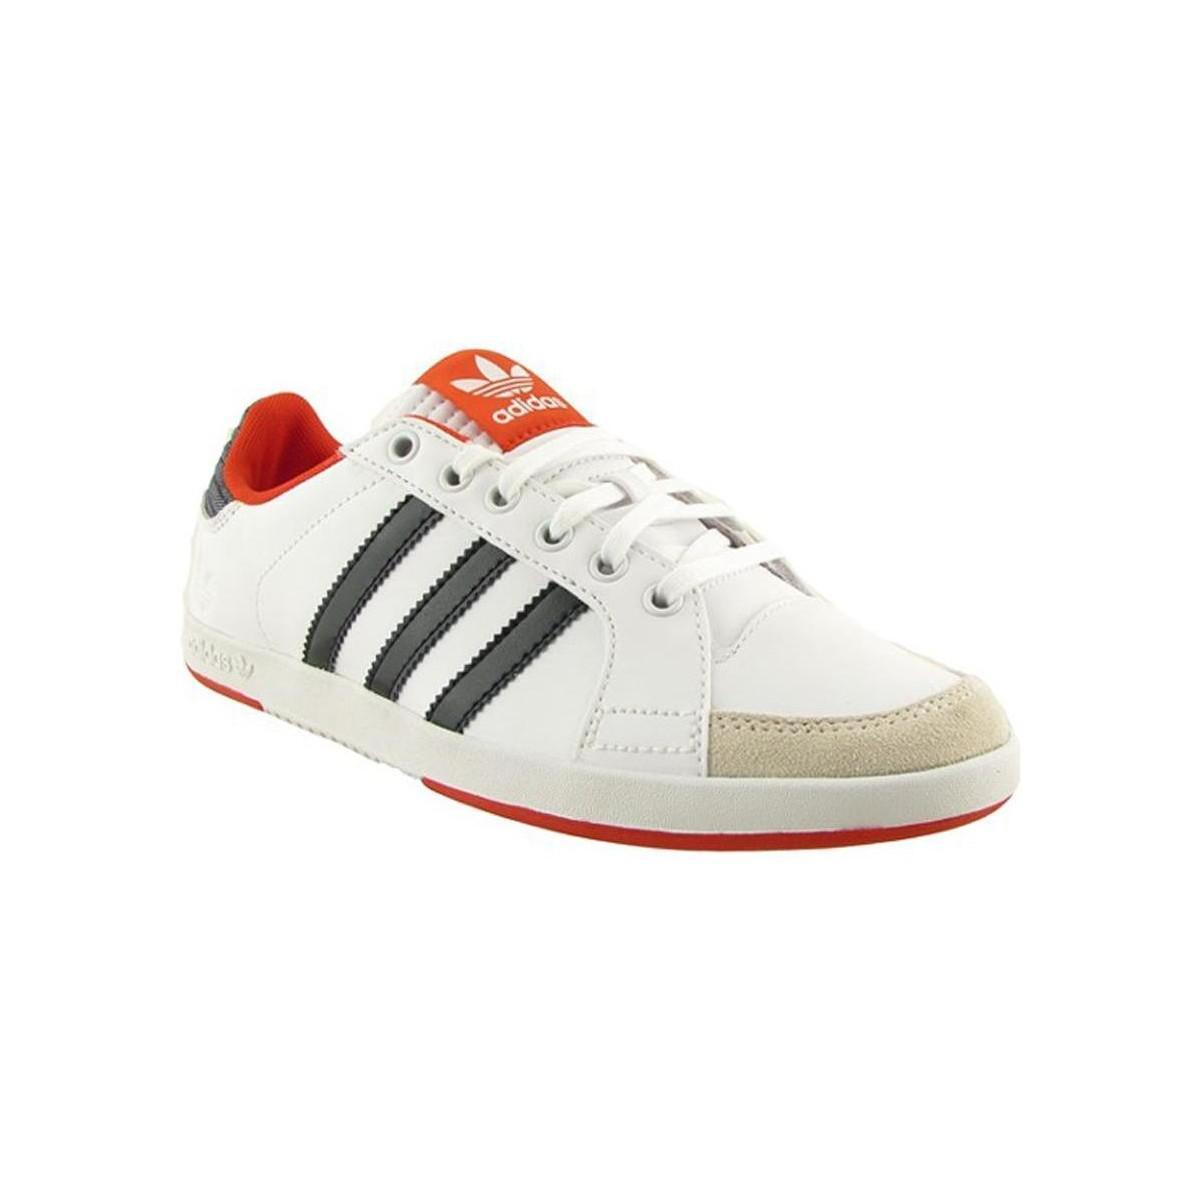 Lyst Adidas Corte Parte Bassa Scarpe Da Donna (Formatori) In Bianco In Bianco.